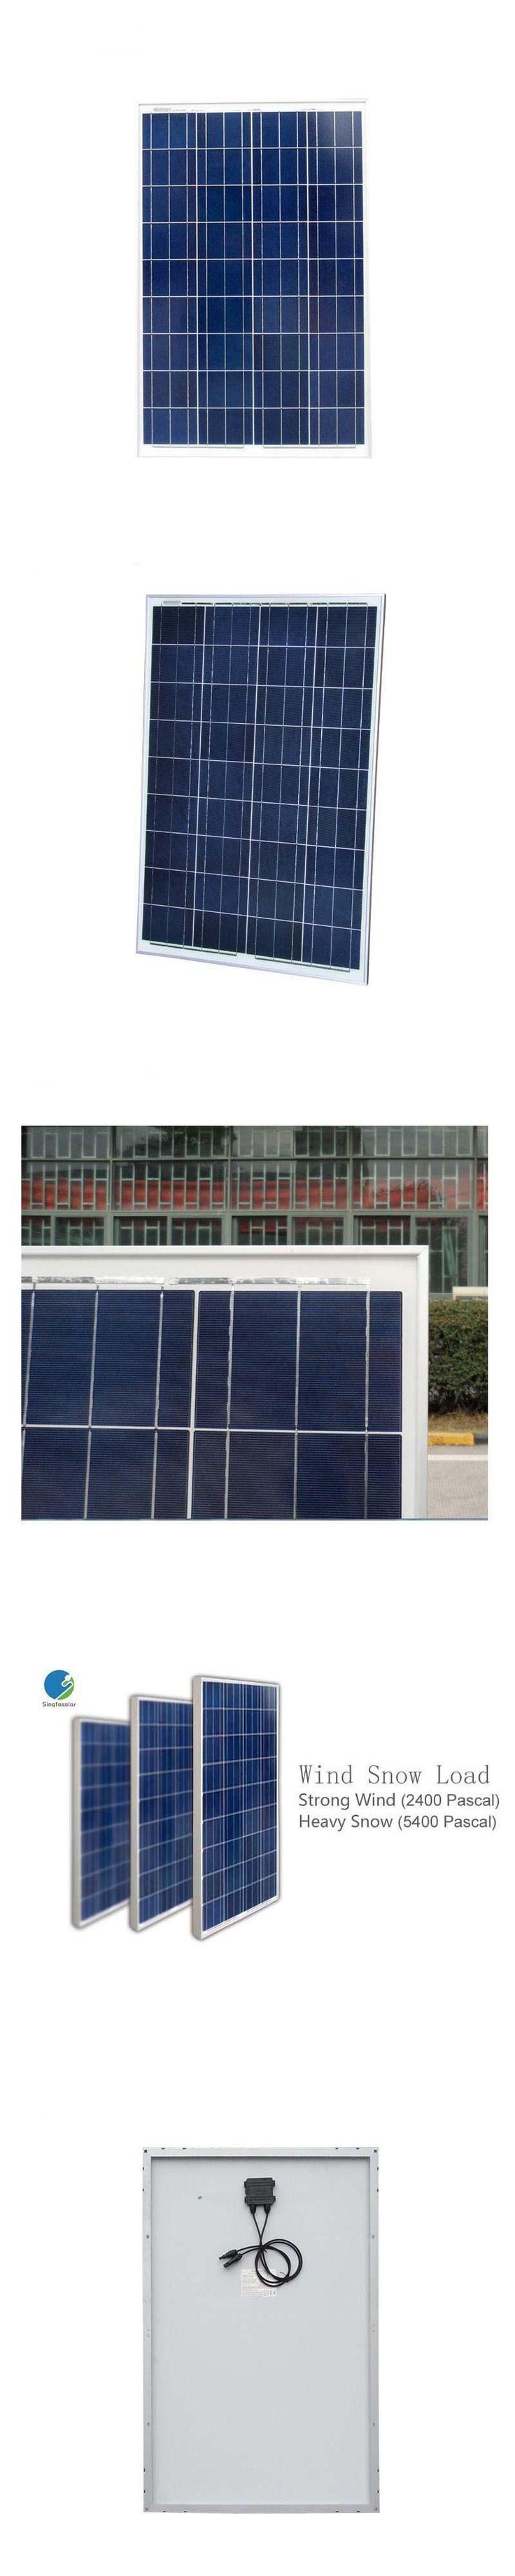 14f5248ce5e0b540f5933799fd68df70 Top Result 50 Inspirational Portable solar Panels Image 2018 Hdj5